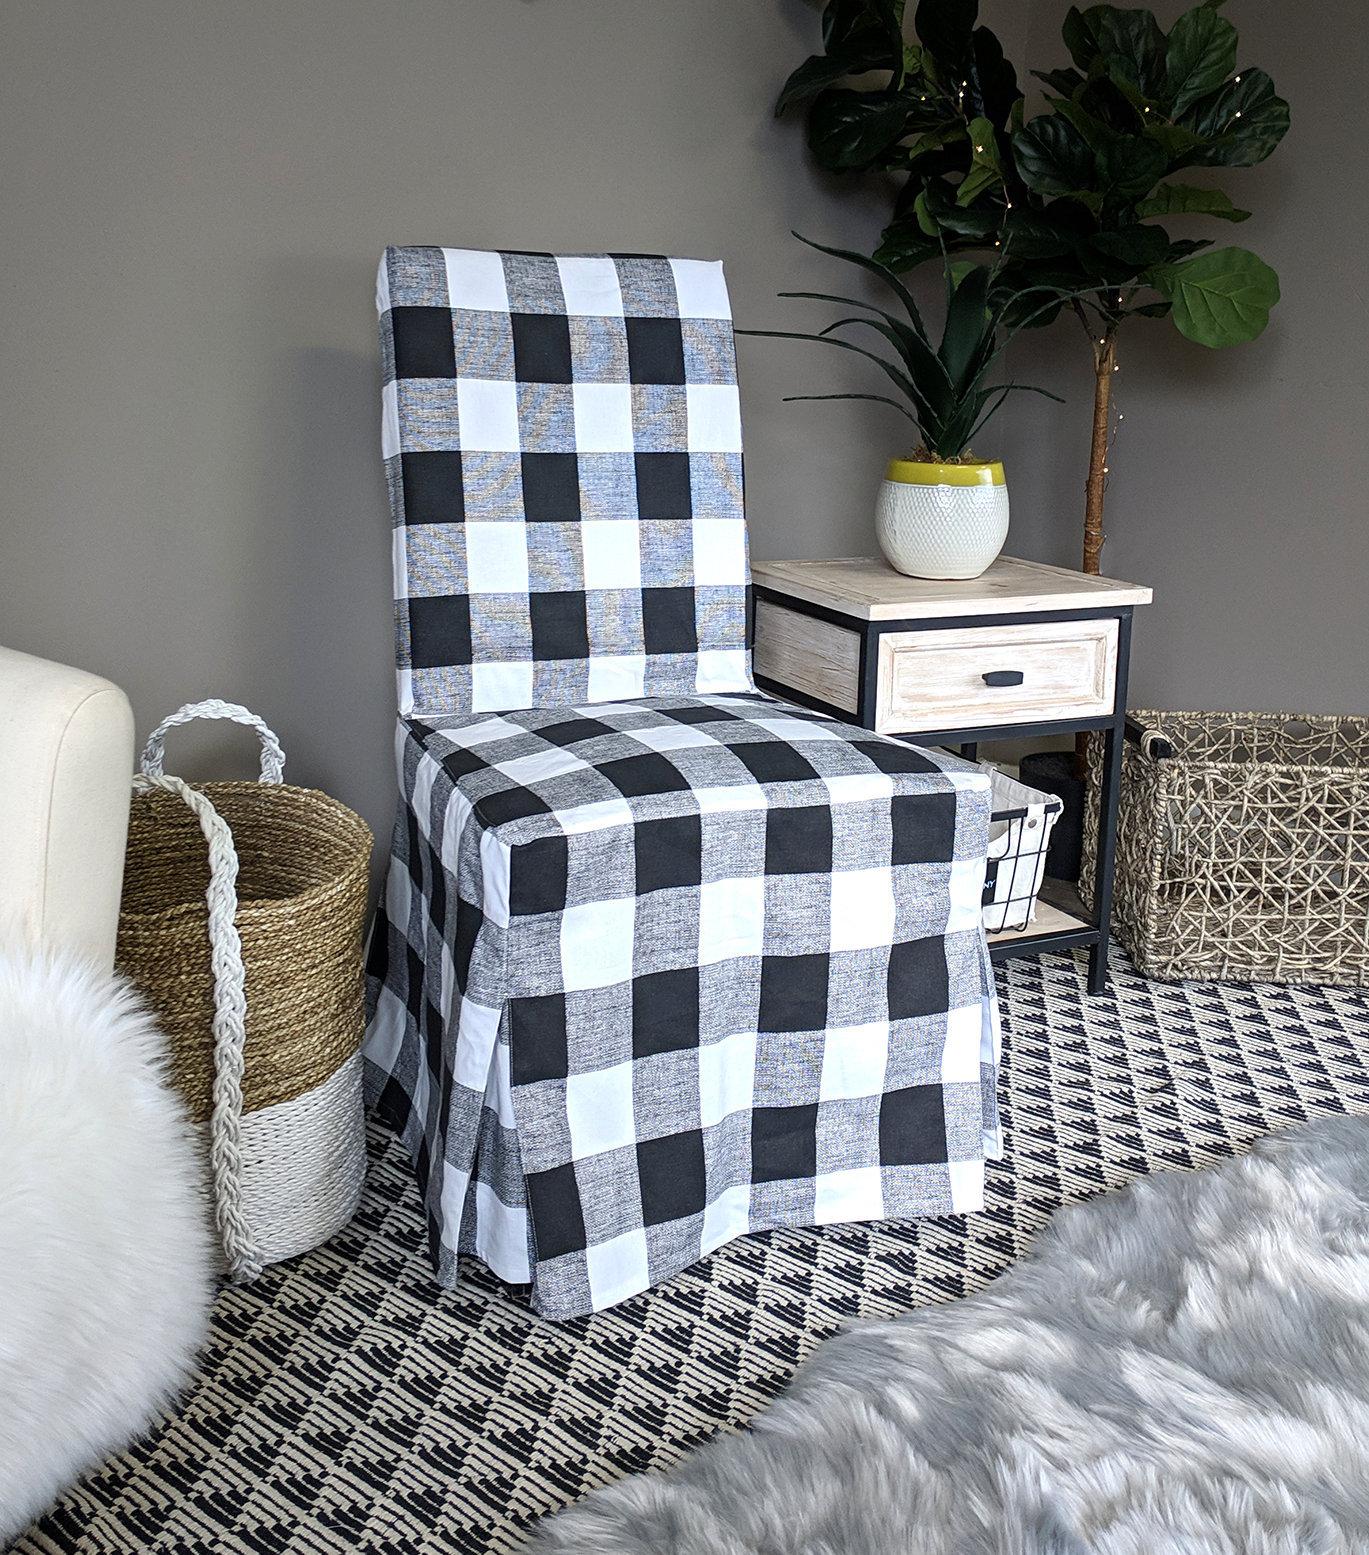 Wondrous Ikea Dining Chair Cover Plaid Buffalo Check Black White Interior Design Ideas Helimdqseriescom